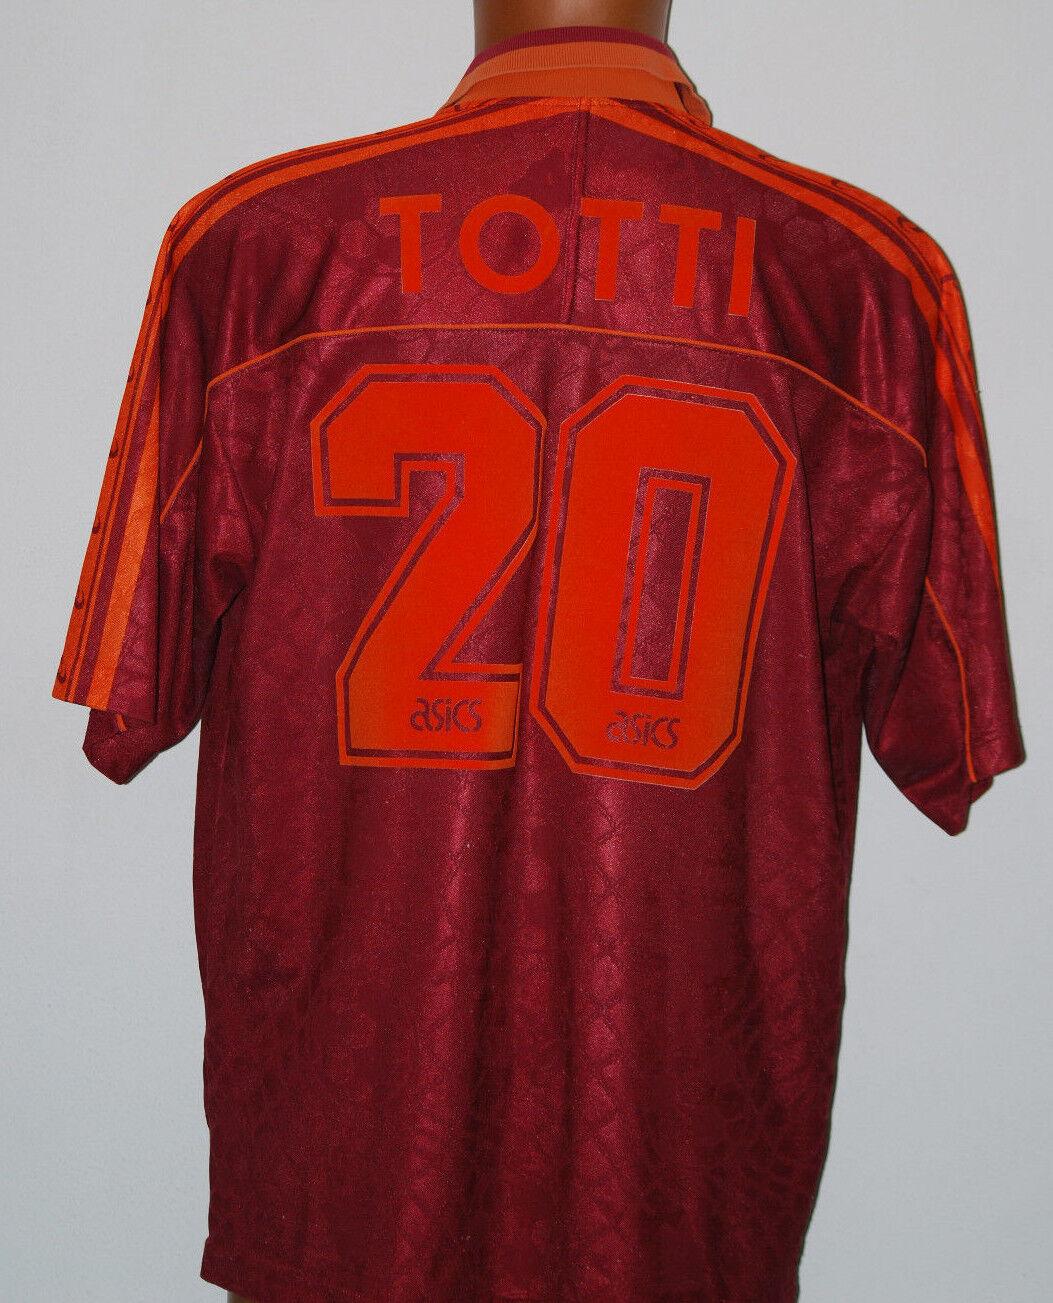 Maglia Totti Roma 1995 1996  20 Ina Assitalia Home Jersey no Match Worn Large